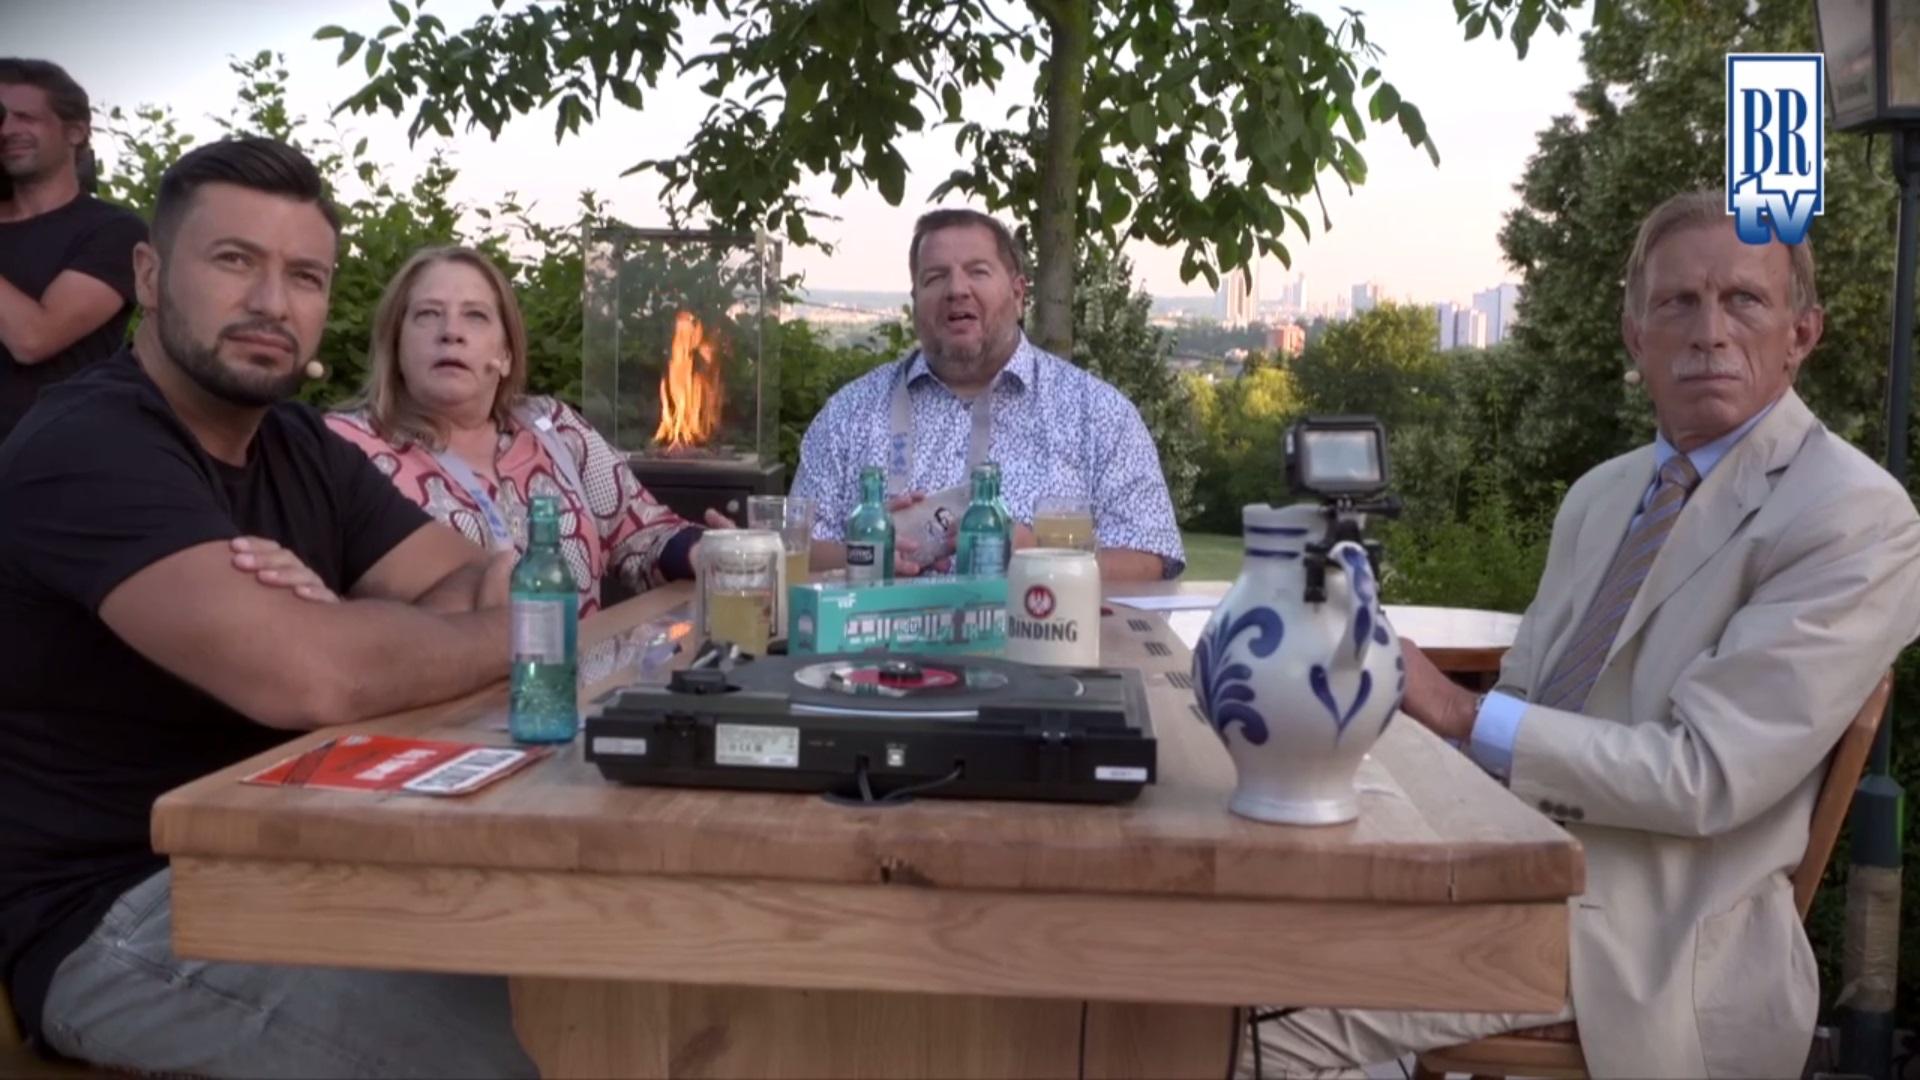 Bembel & Gebabbel – Folge 45 mit Christoph Daum, Kathy Kelly & Cüneyt Akanb